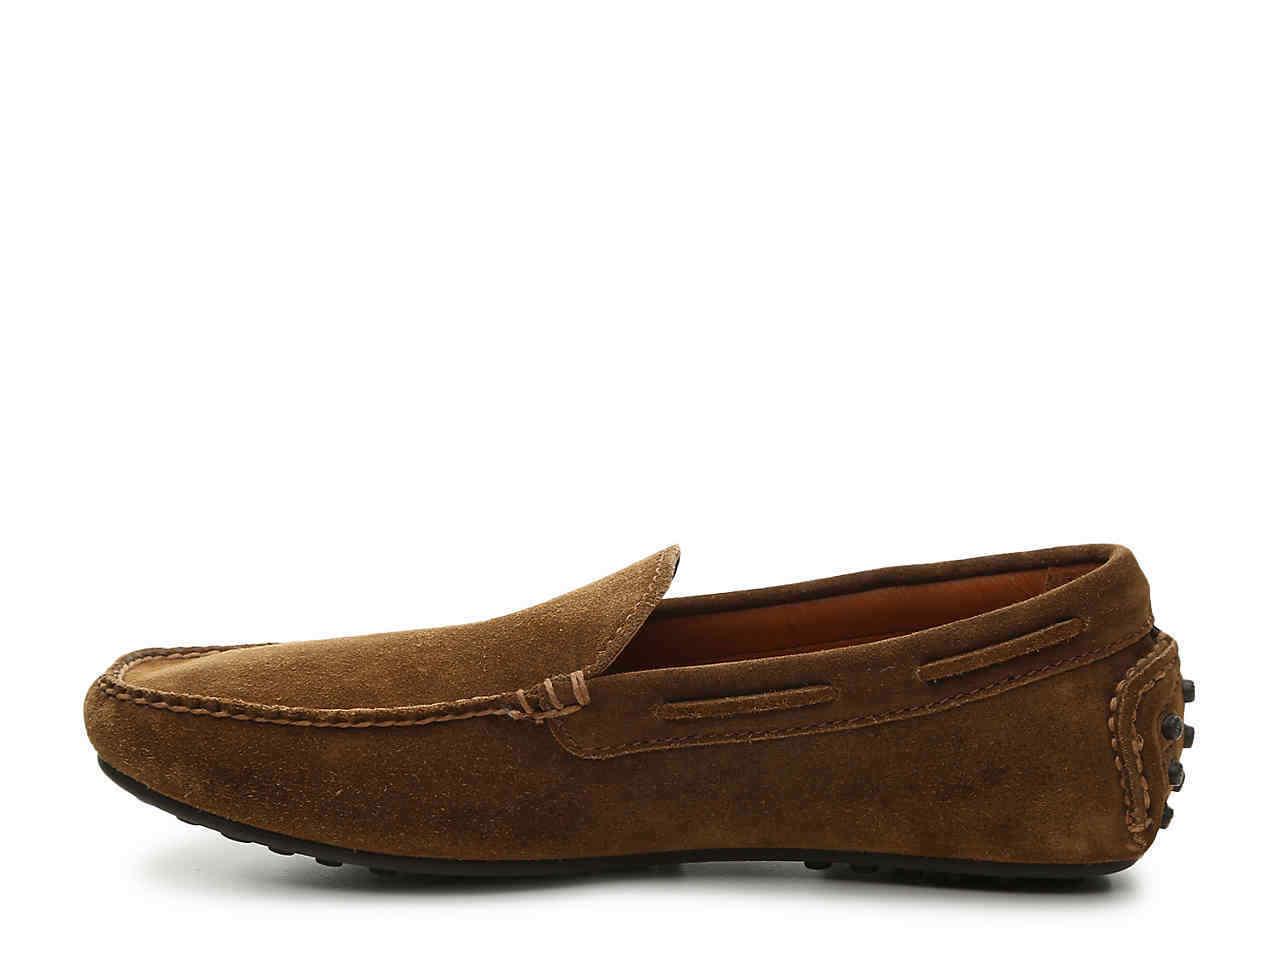 New Frye Men's Allen Venetian Drivers Brown Suede Loafers shoes sz 12M D